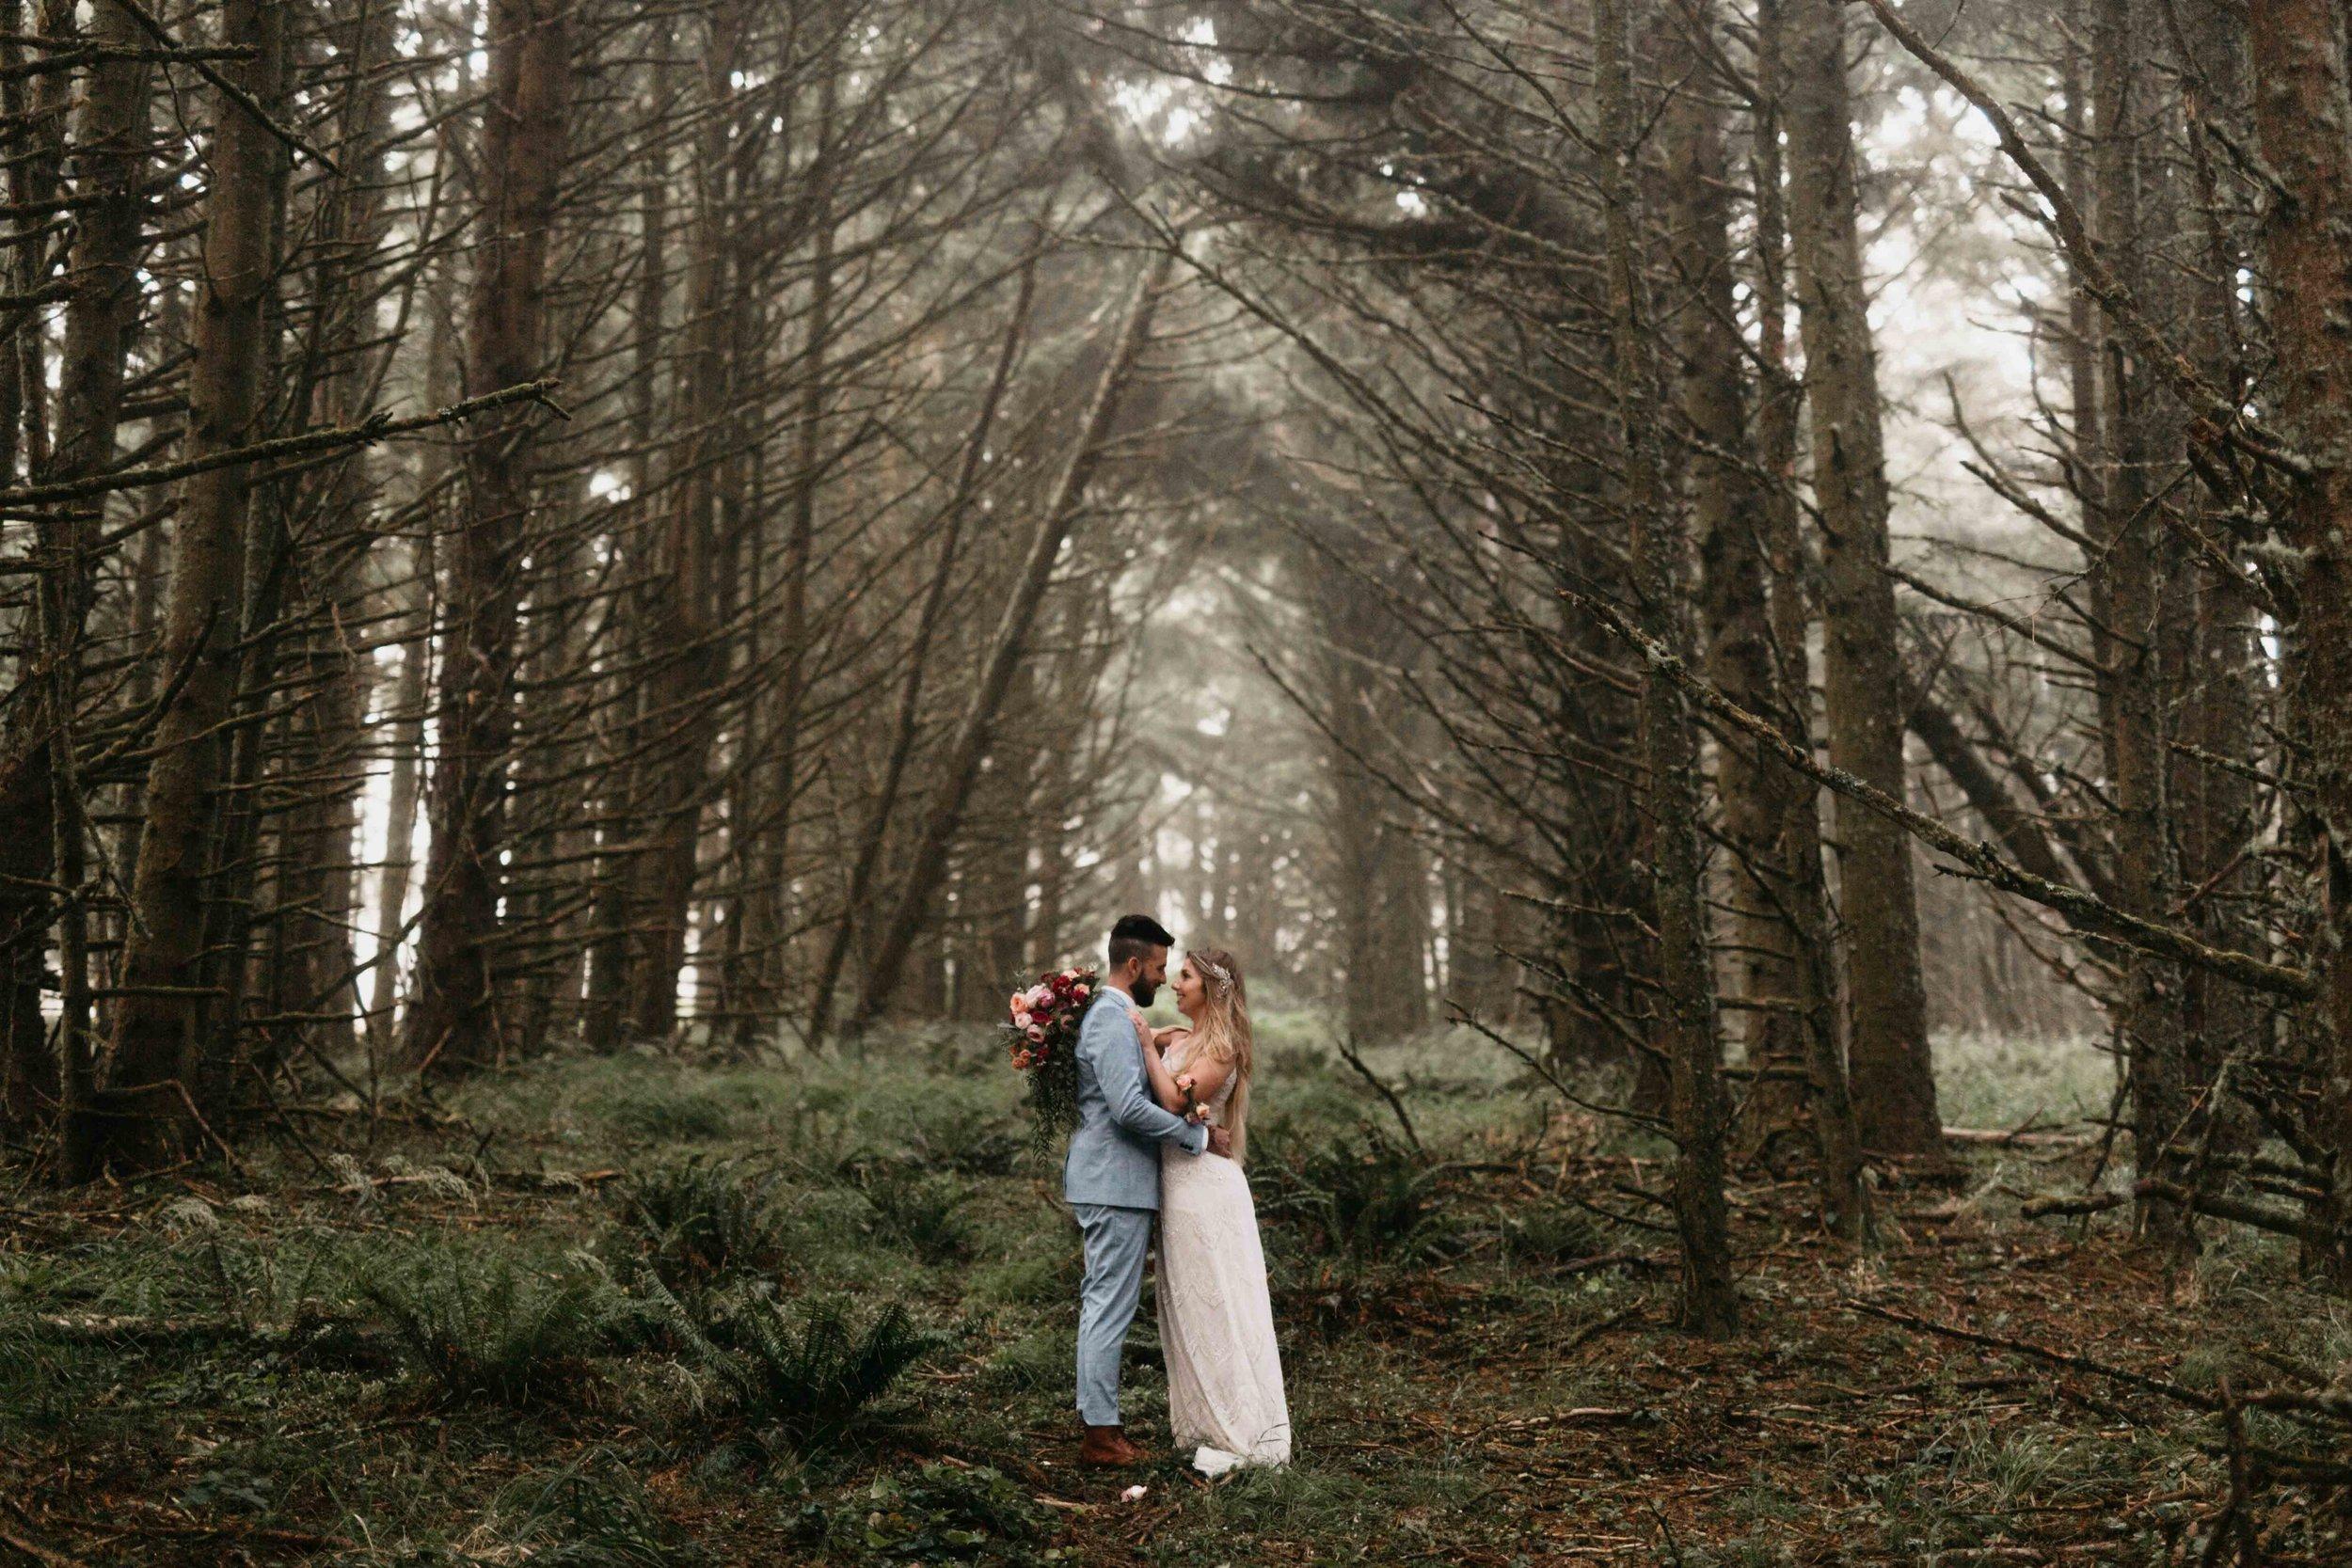 Utah-Wedding-Utah-Photographer-6.jpg